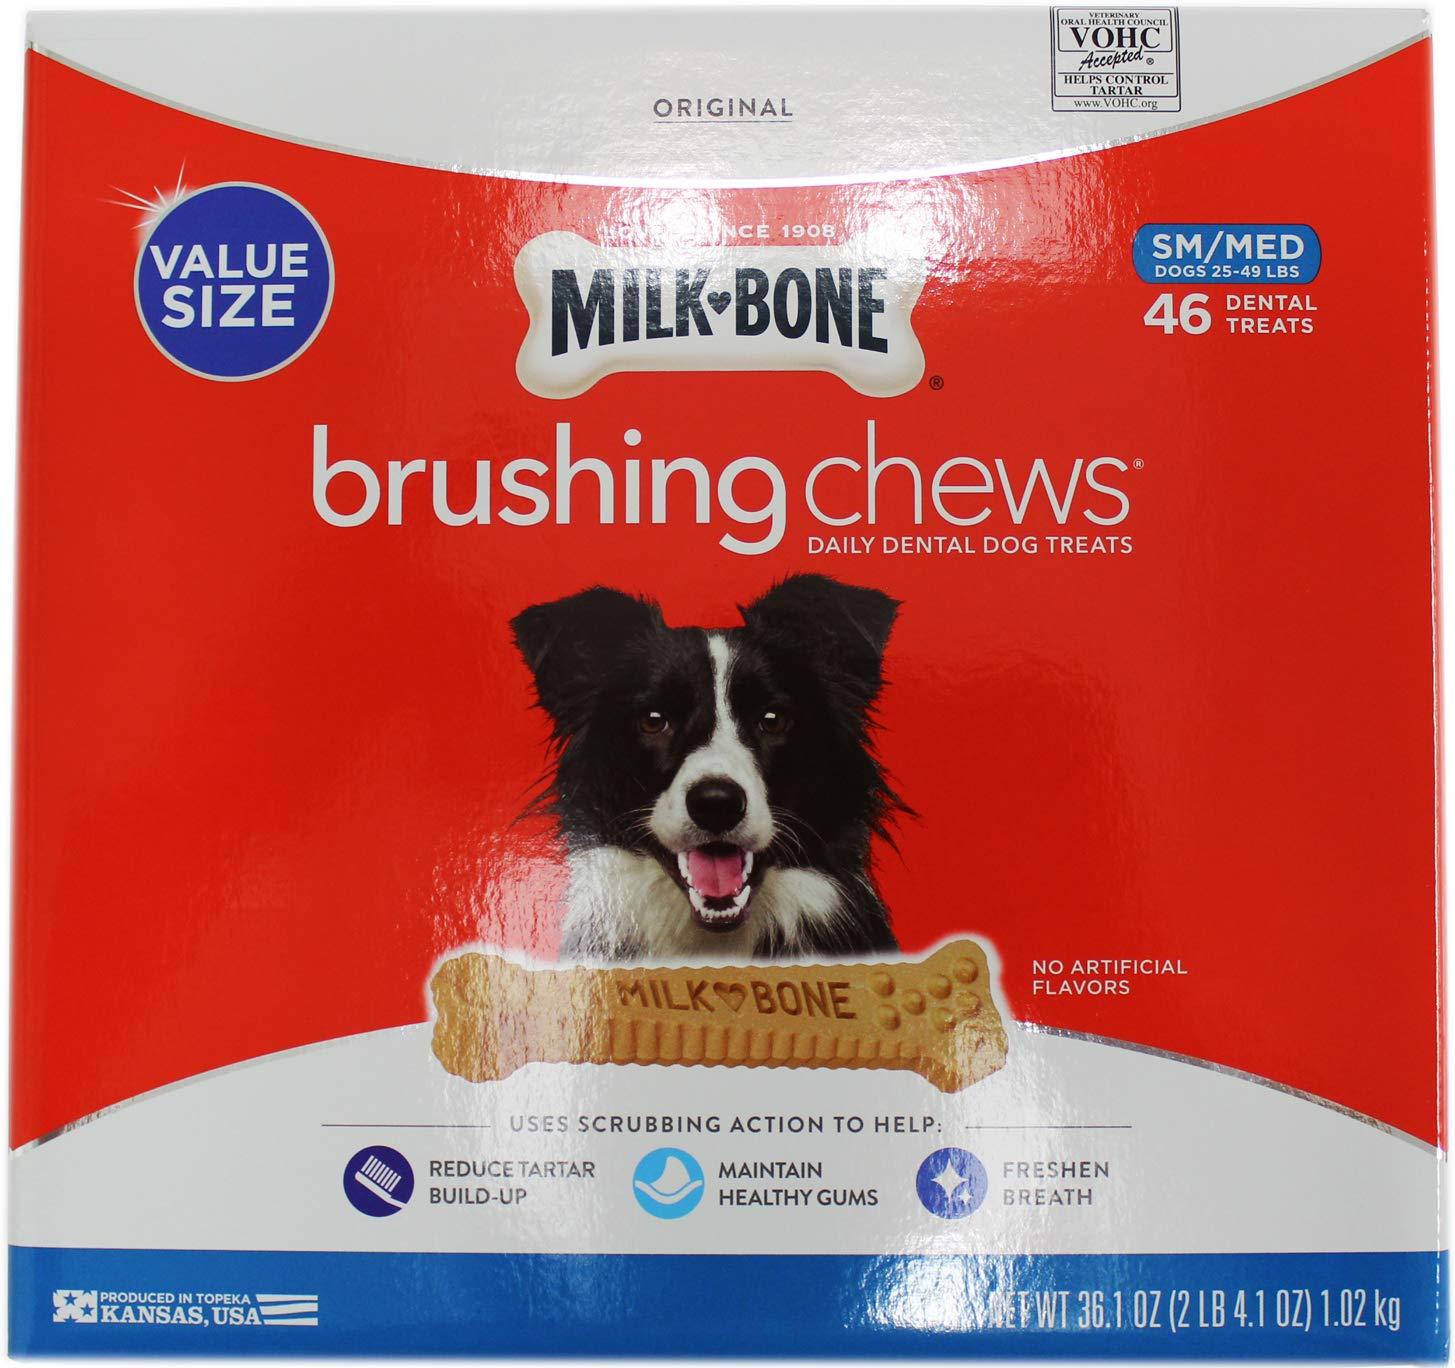 Milk-Bone Brushing Chews Daily Dental Treats, Small Medium, 46 ct